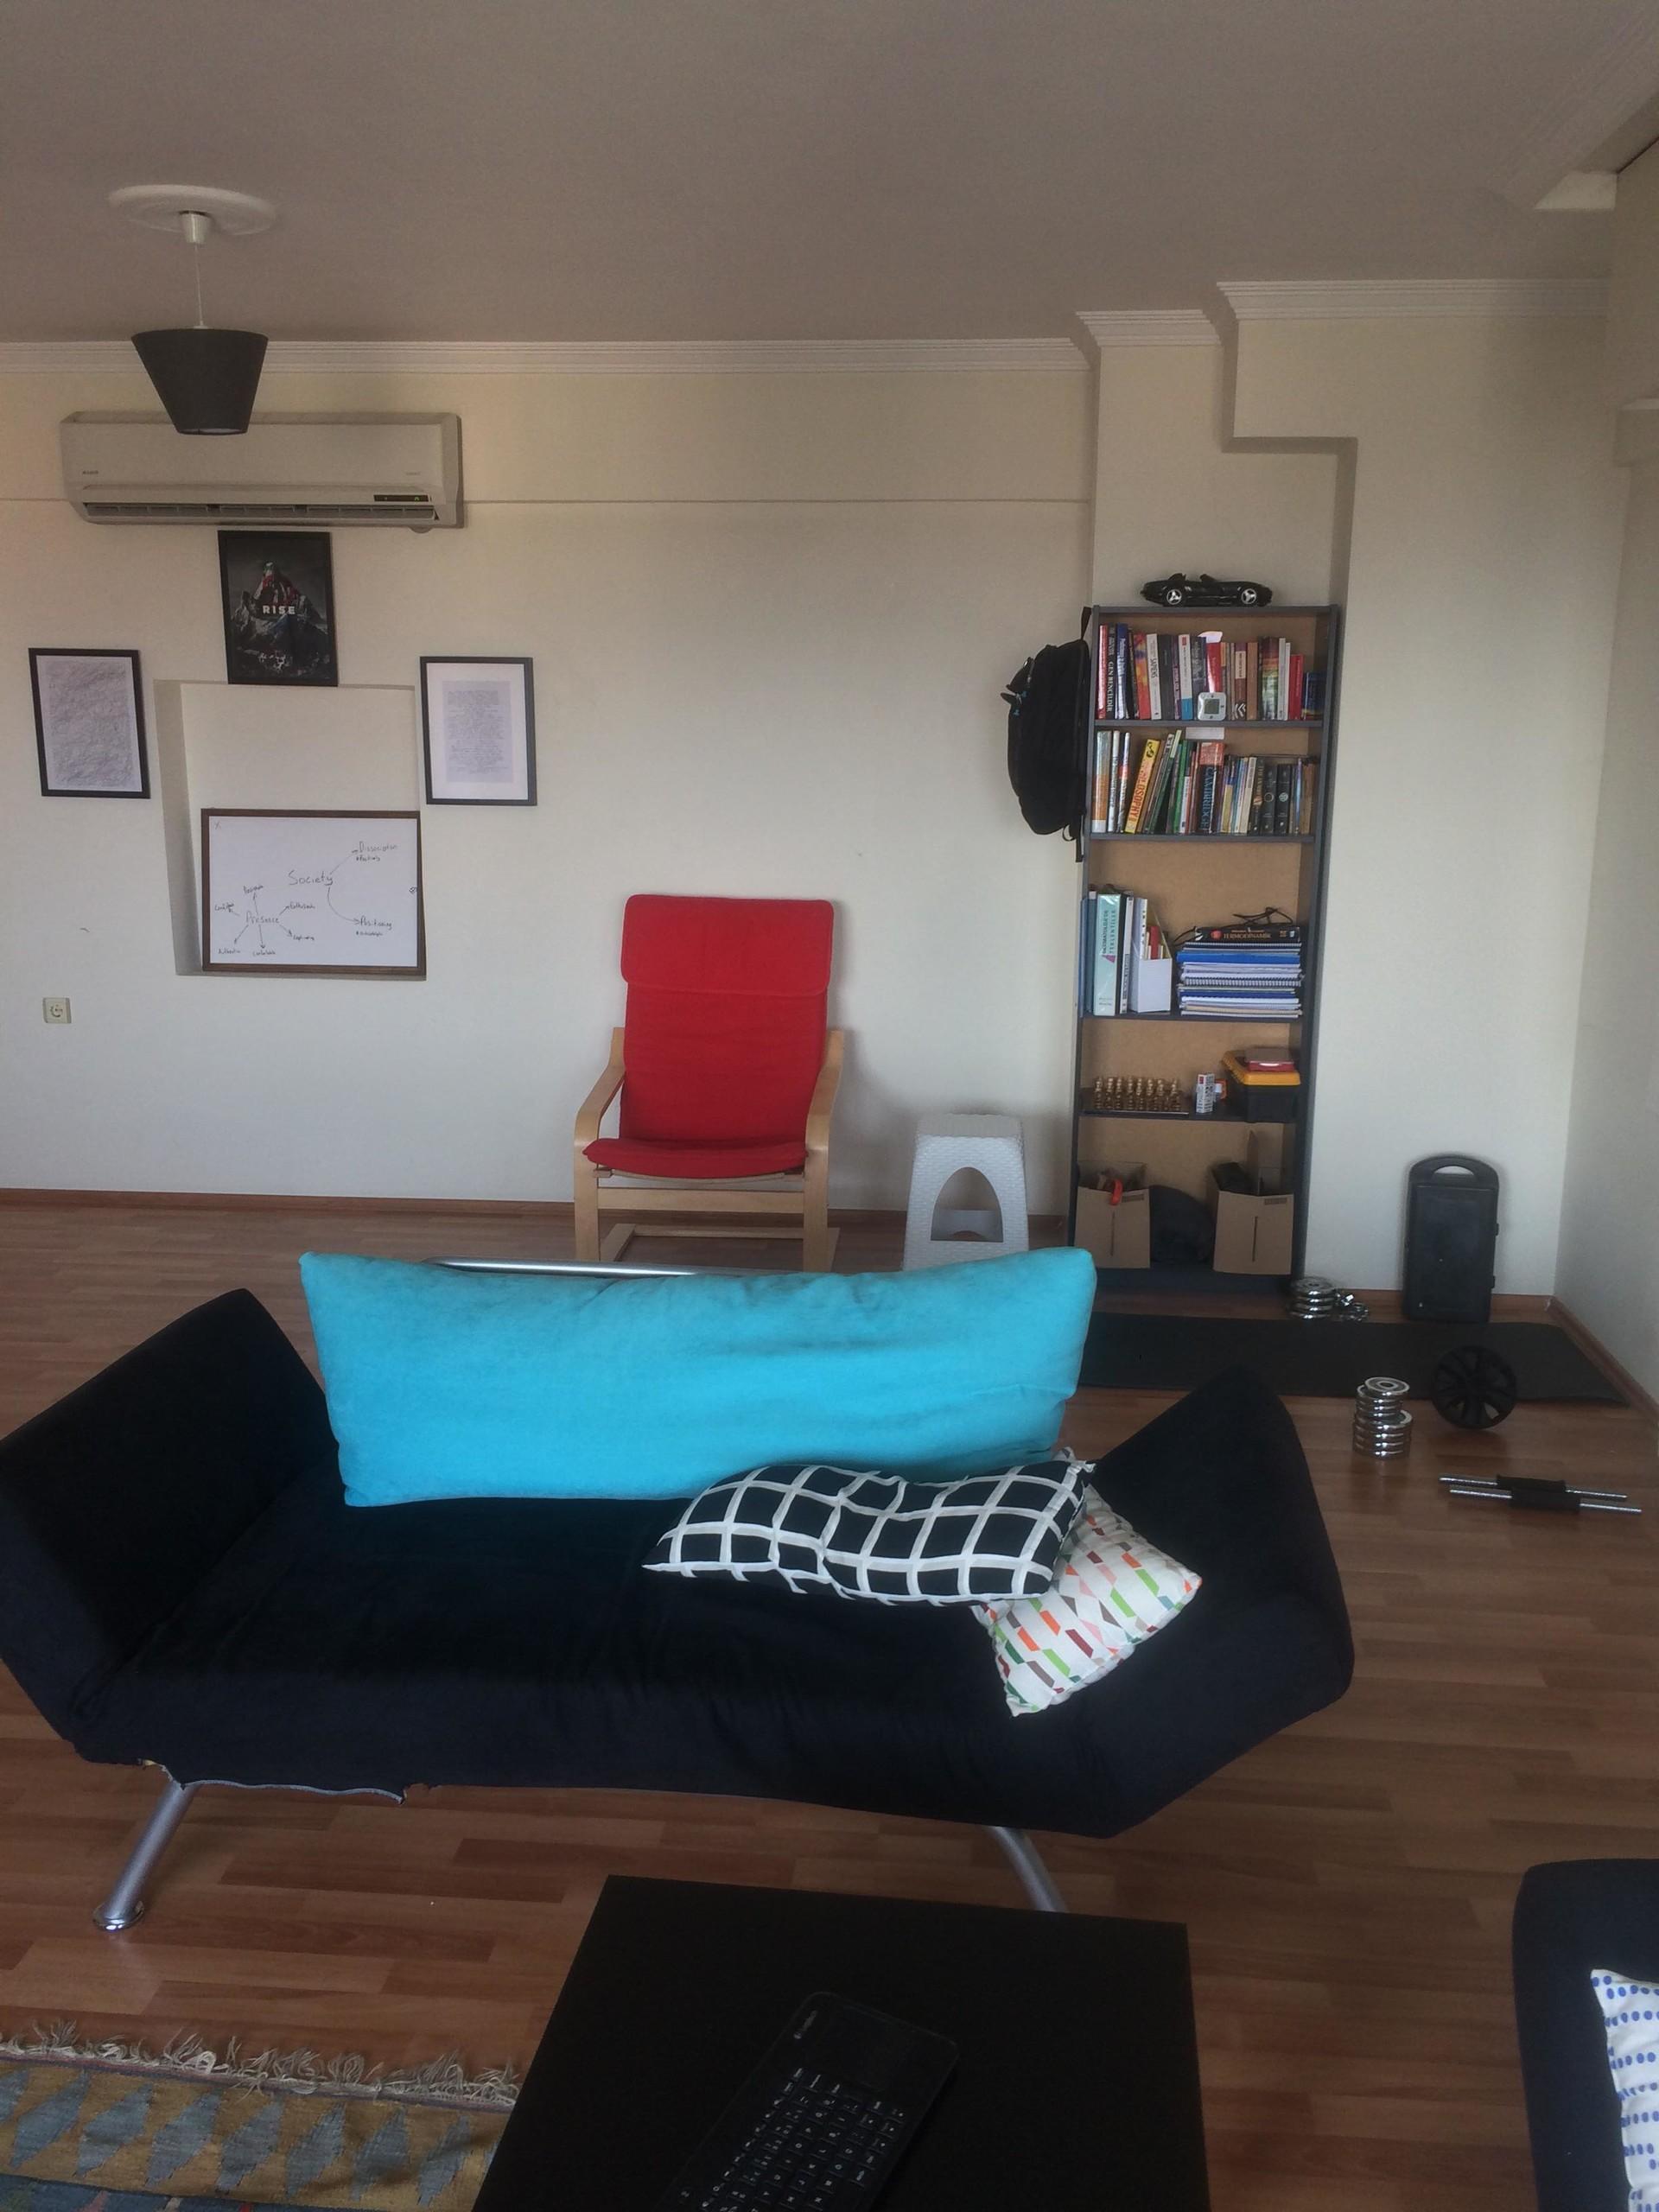 apartment-suite-spacious-saloon-balcony-near-evka-3-subway-station-ab7d0a4446a32b5d2e0e7faa7fb14ebd